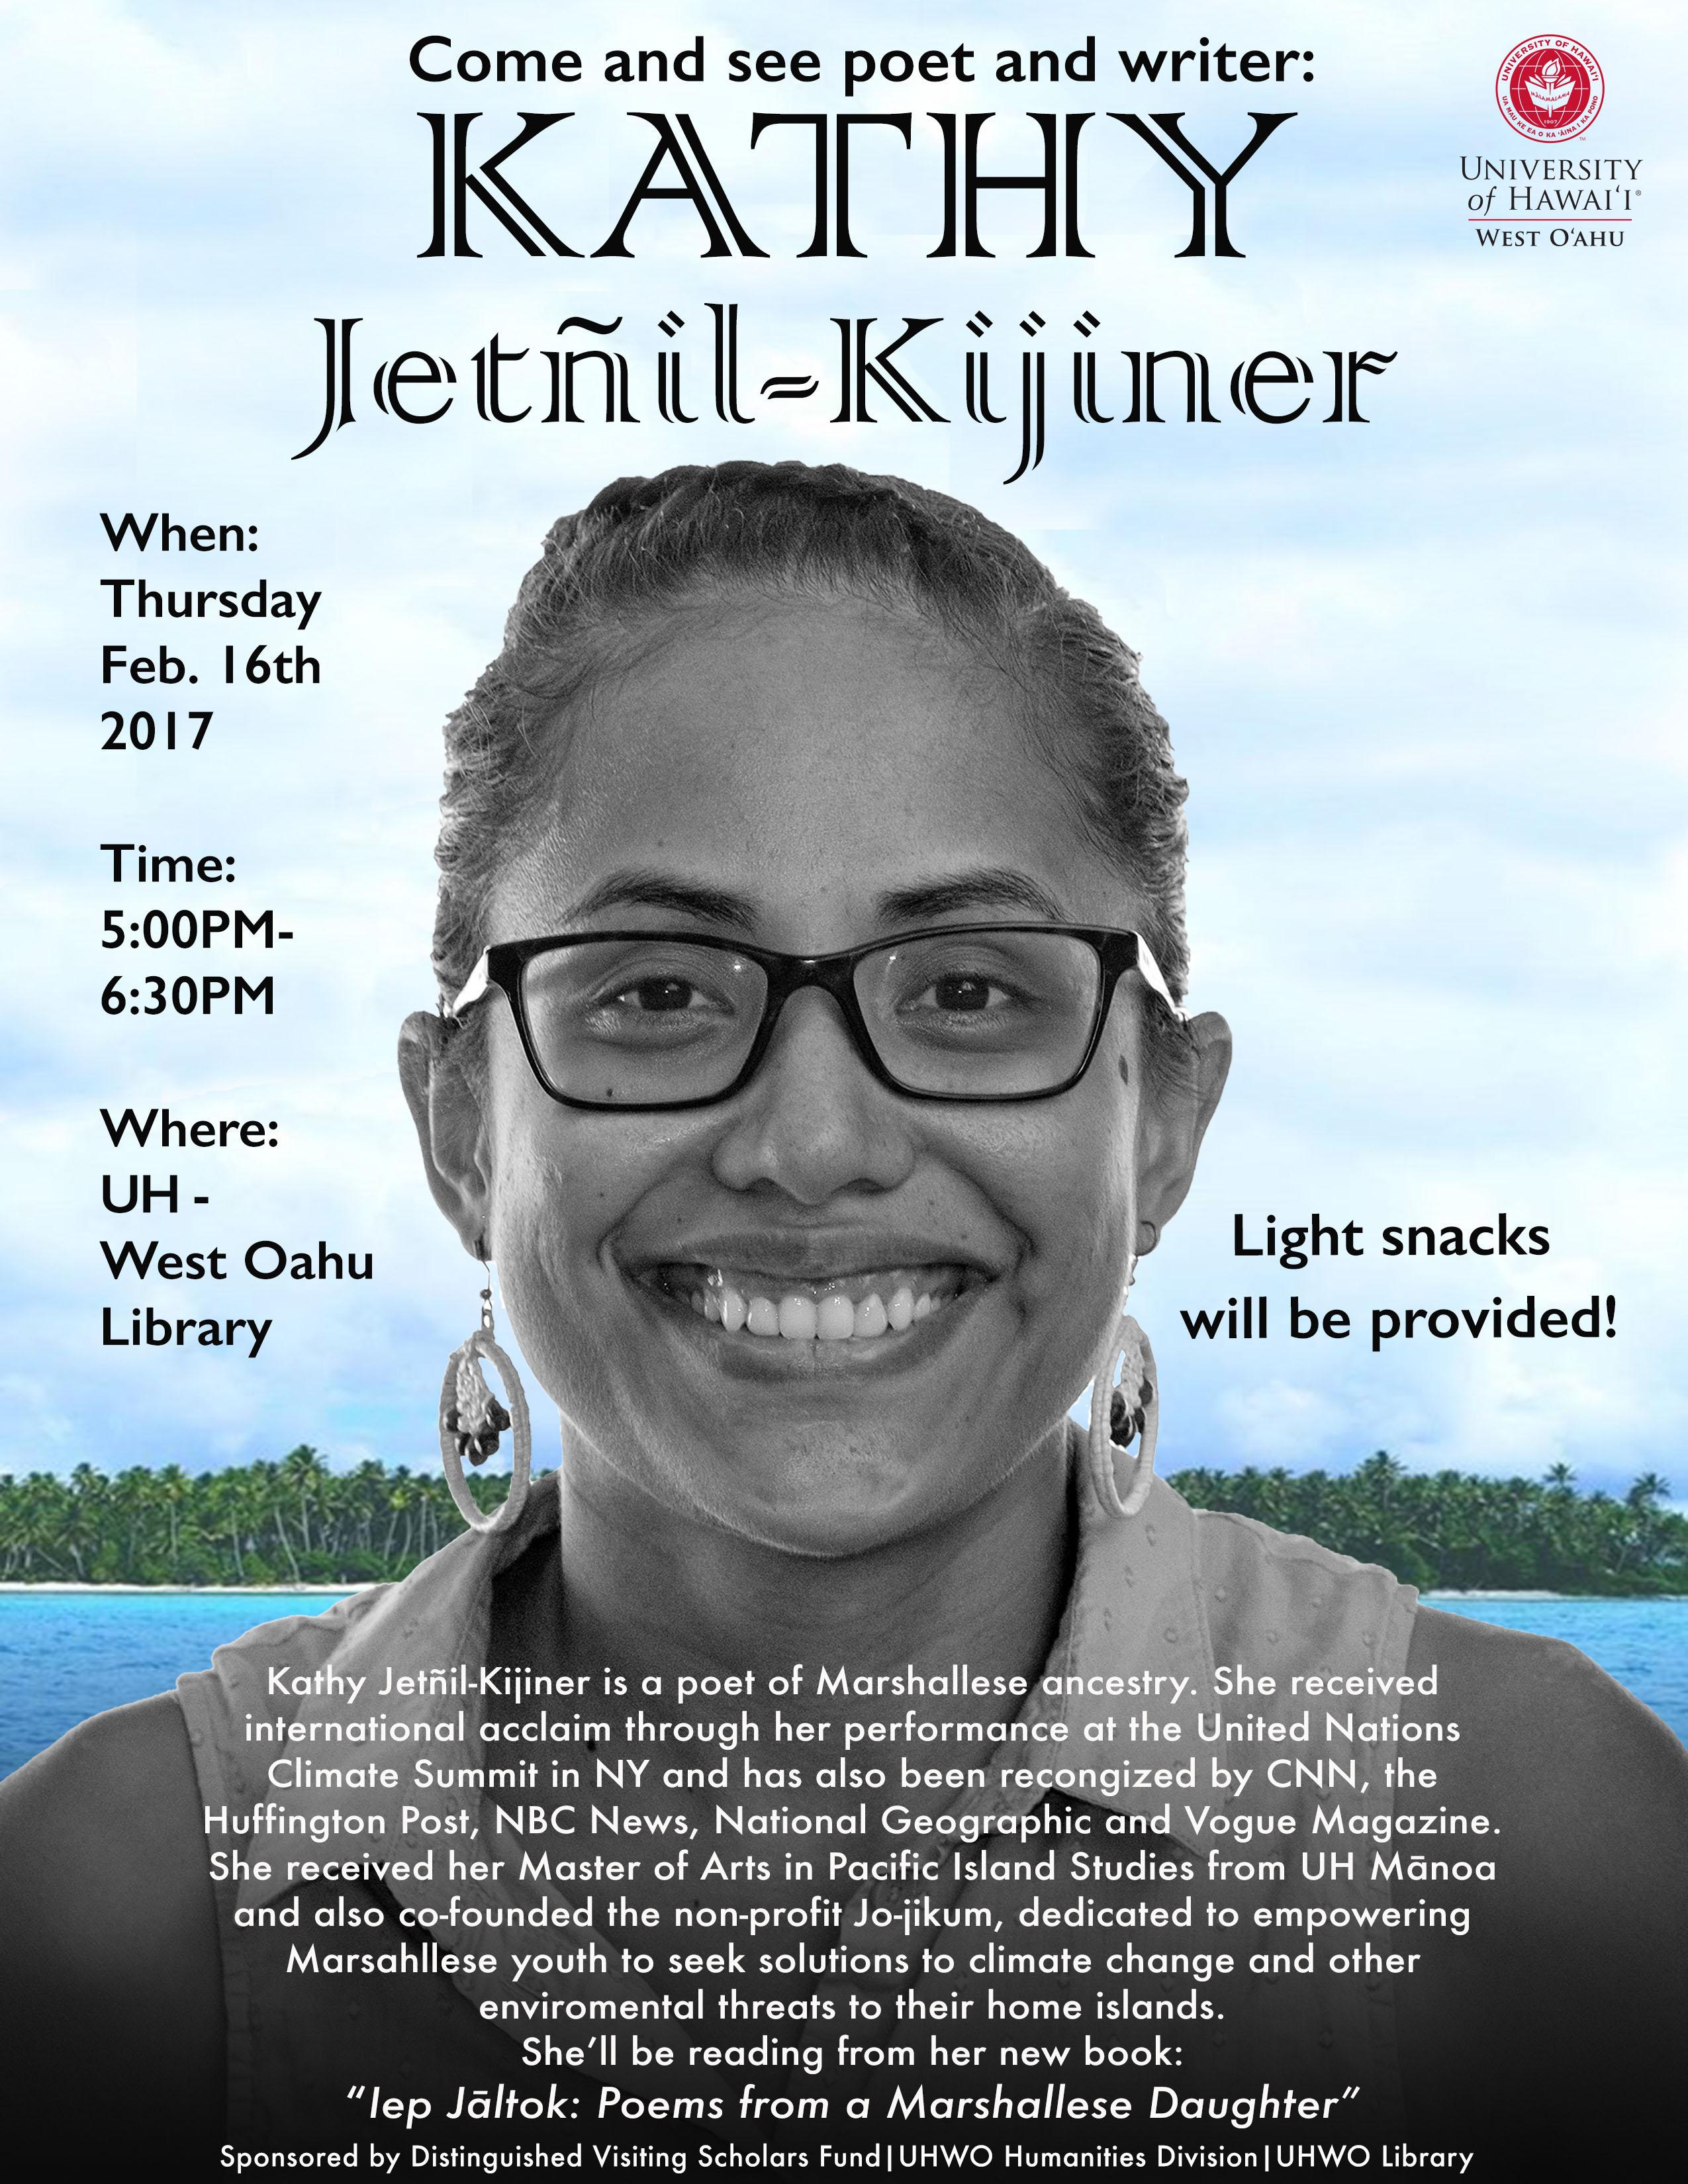 Kathy Jetñil-Kijiner speaking at UHWO on Feb. 16.